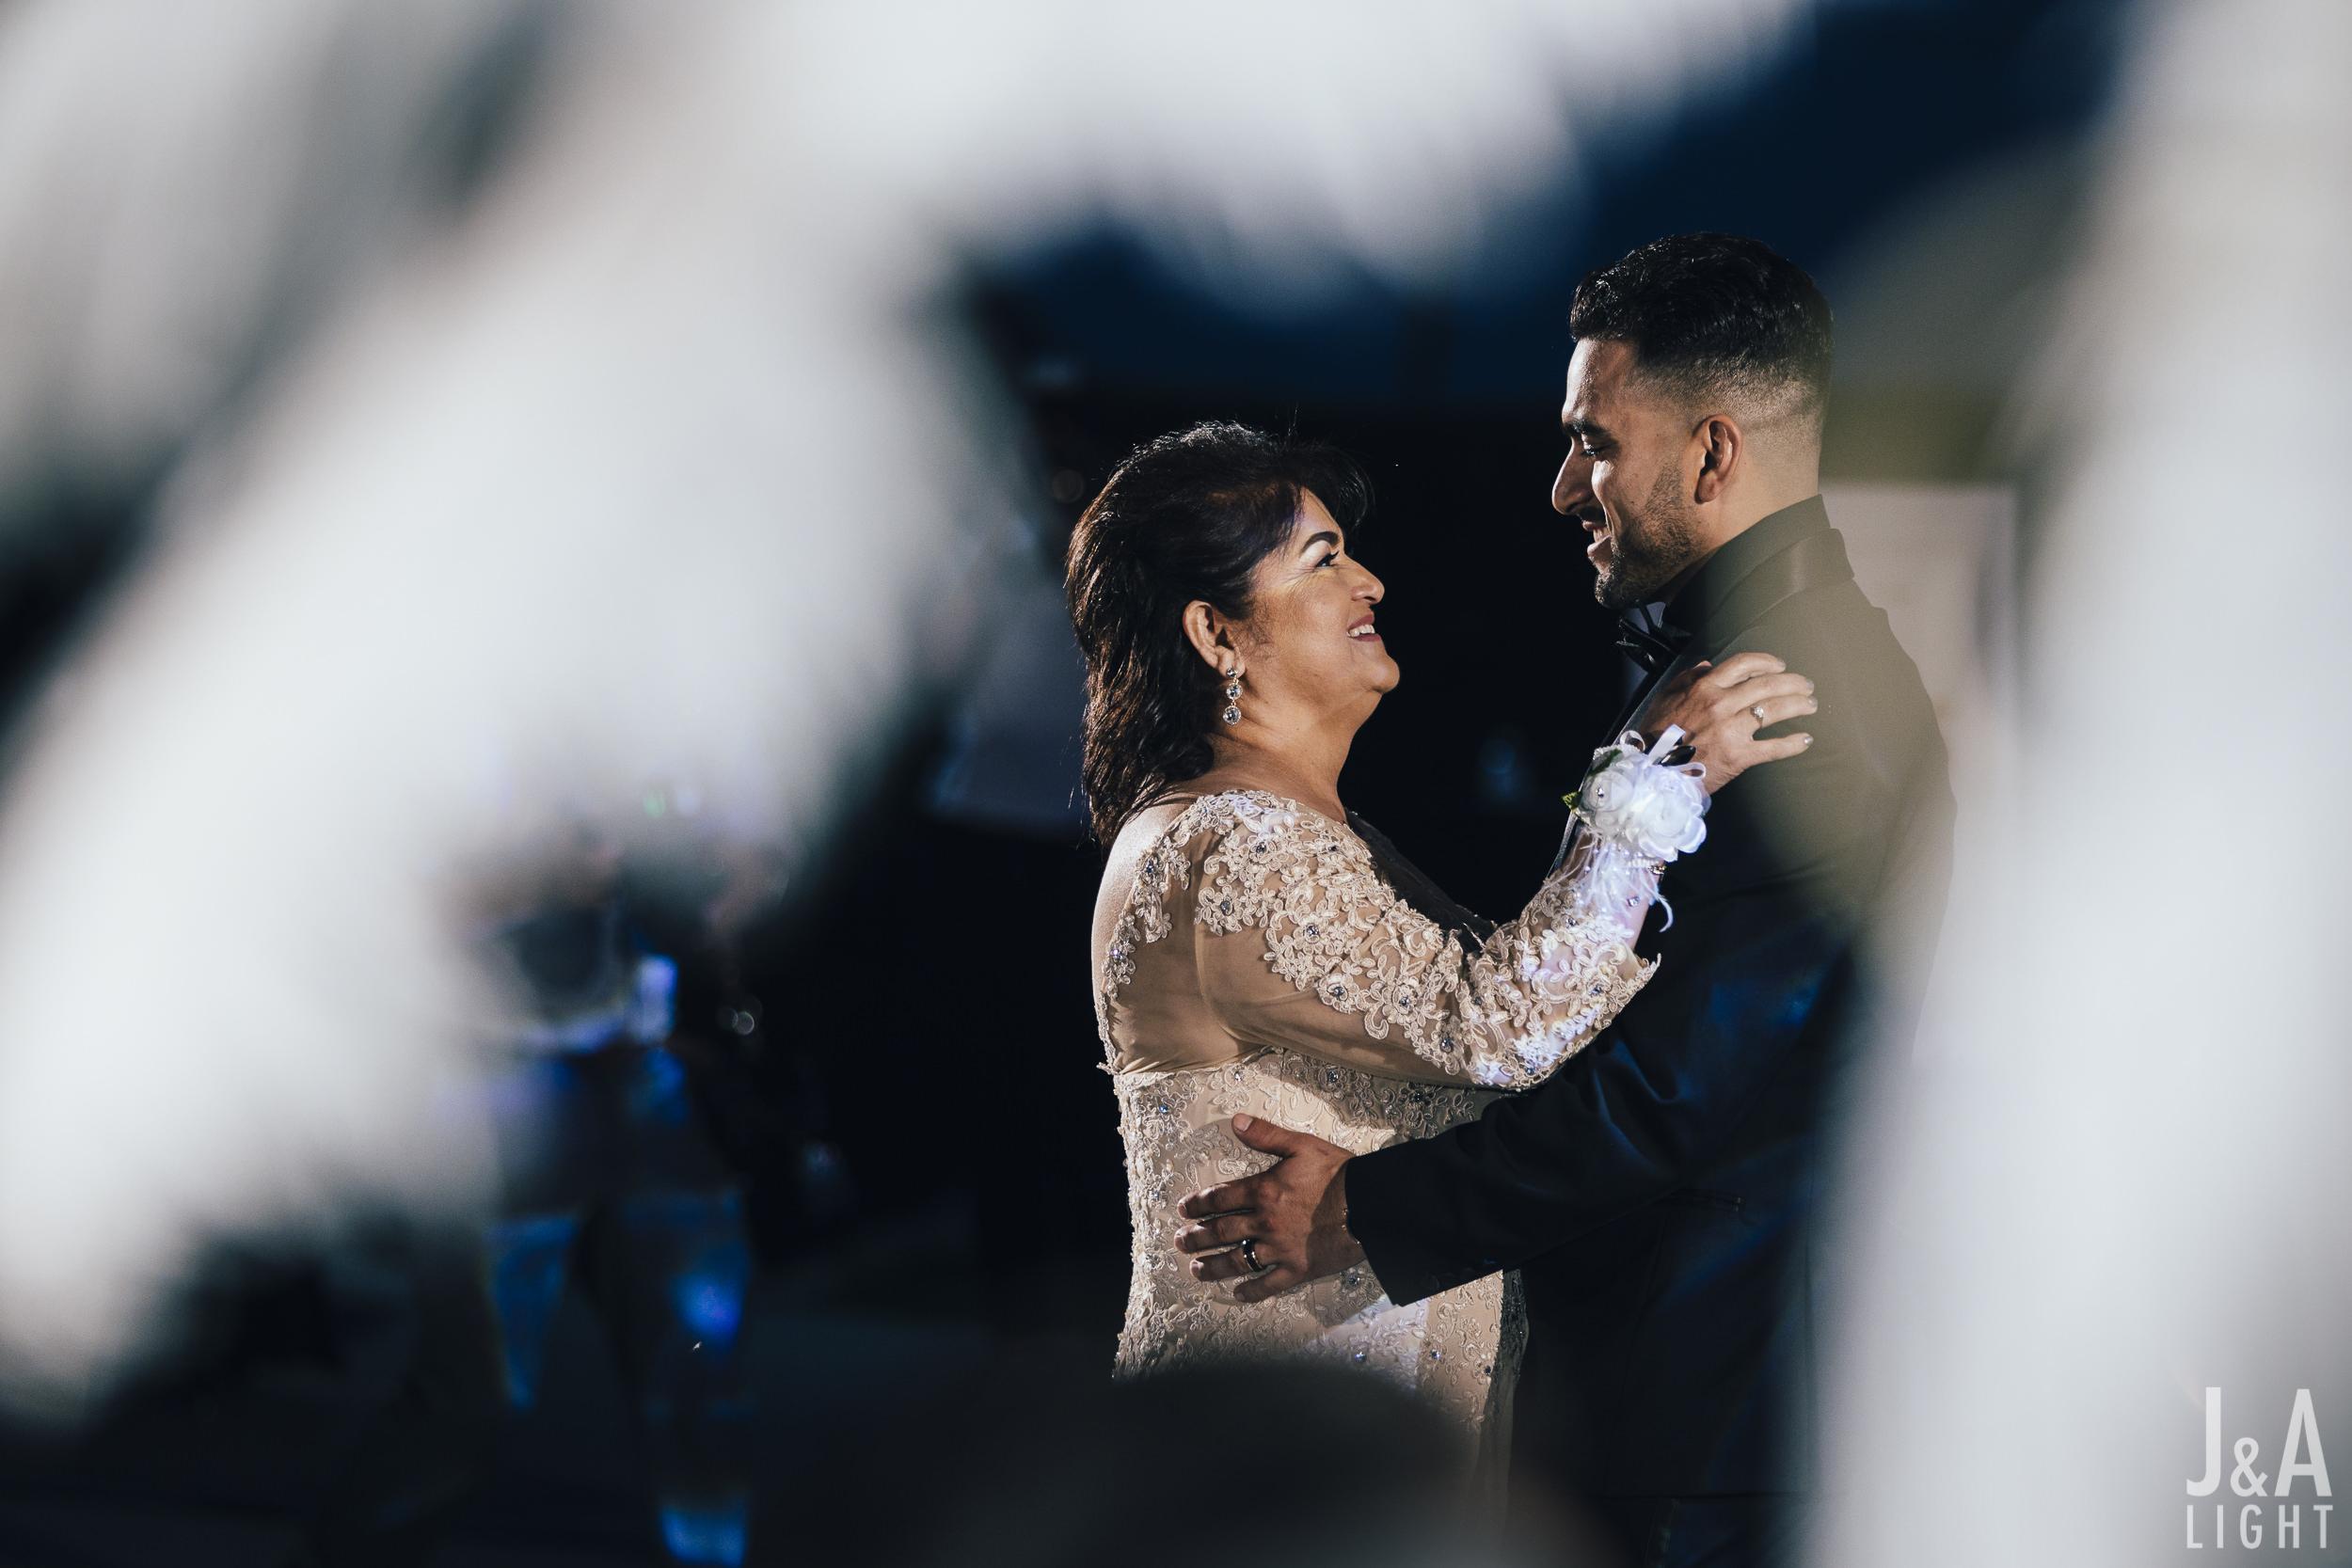 20171014-JanDan-LosBanos-GlassMansion-Wedding-Blog-067.jpg